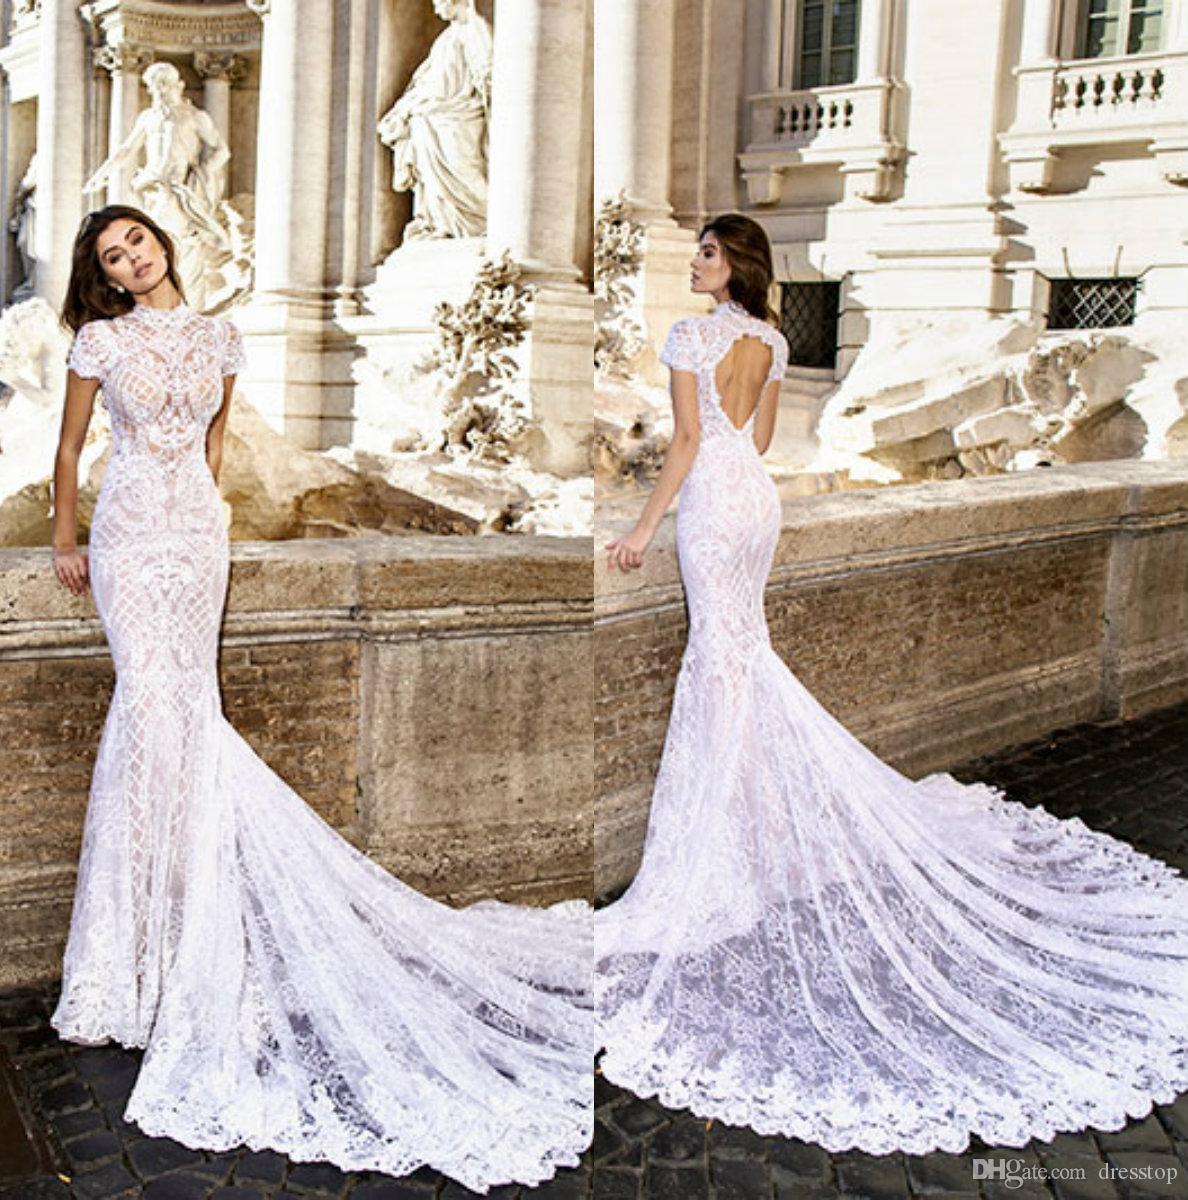 059e81ffd9 Elegant Mermaid Wedding Dresses High Neck Keyhole Back Full Lace Bridal  Gowns Sweep Train Illusion Short Sleeves Formal Wedding Dress Beautiful  Lace Wedding ...